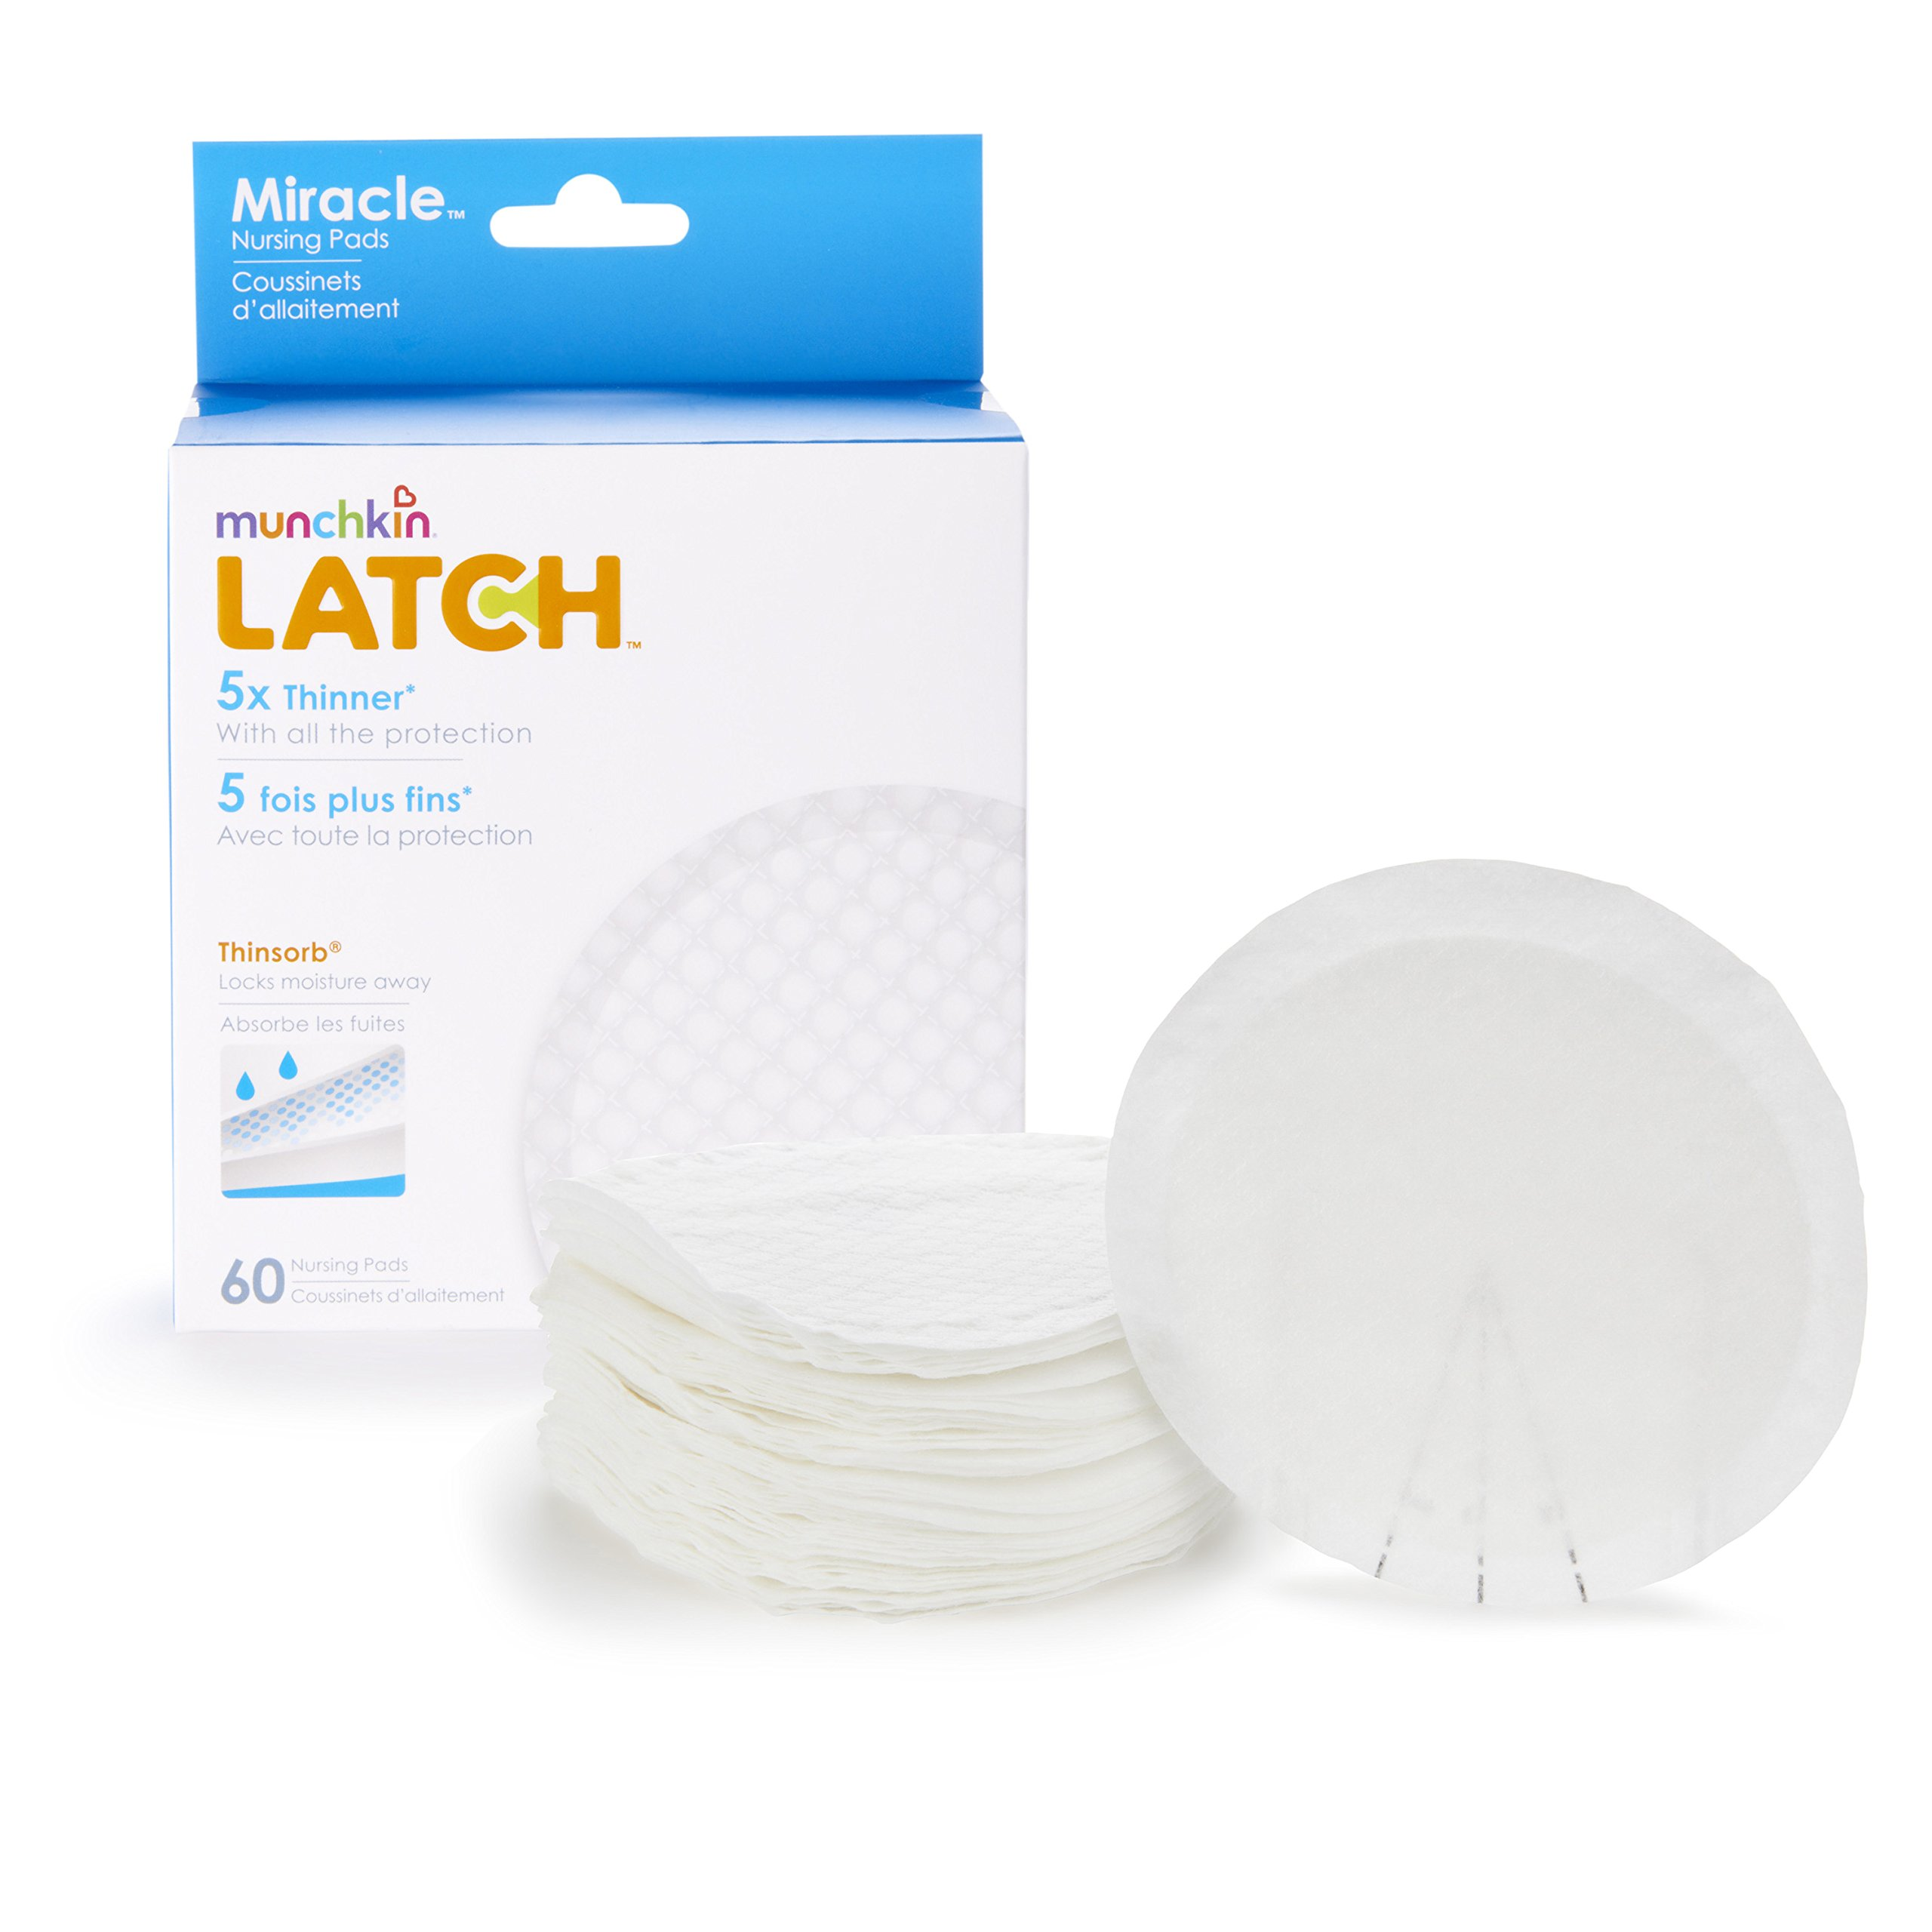 Munchkin Latch Miracle Nursing Pads by Munchkin